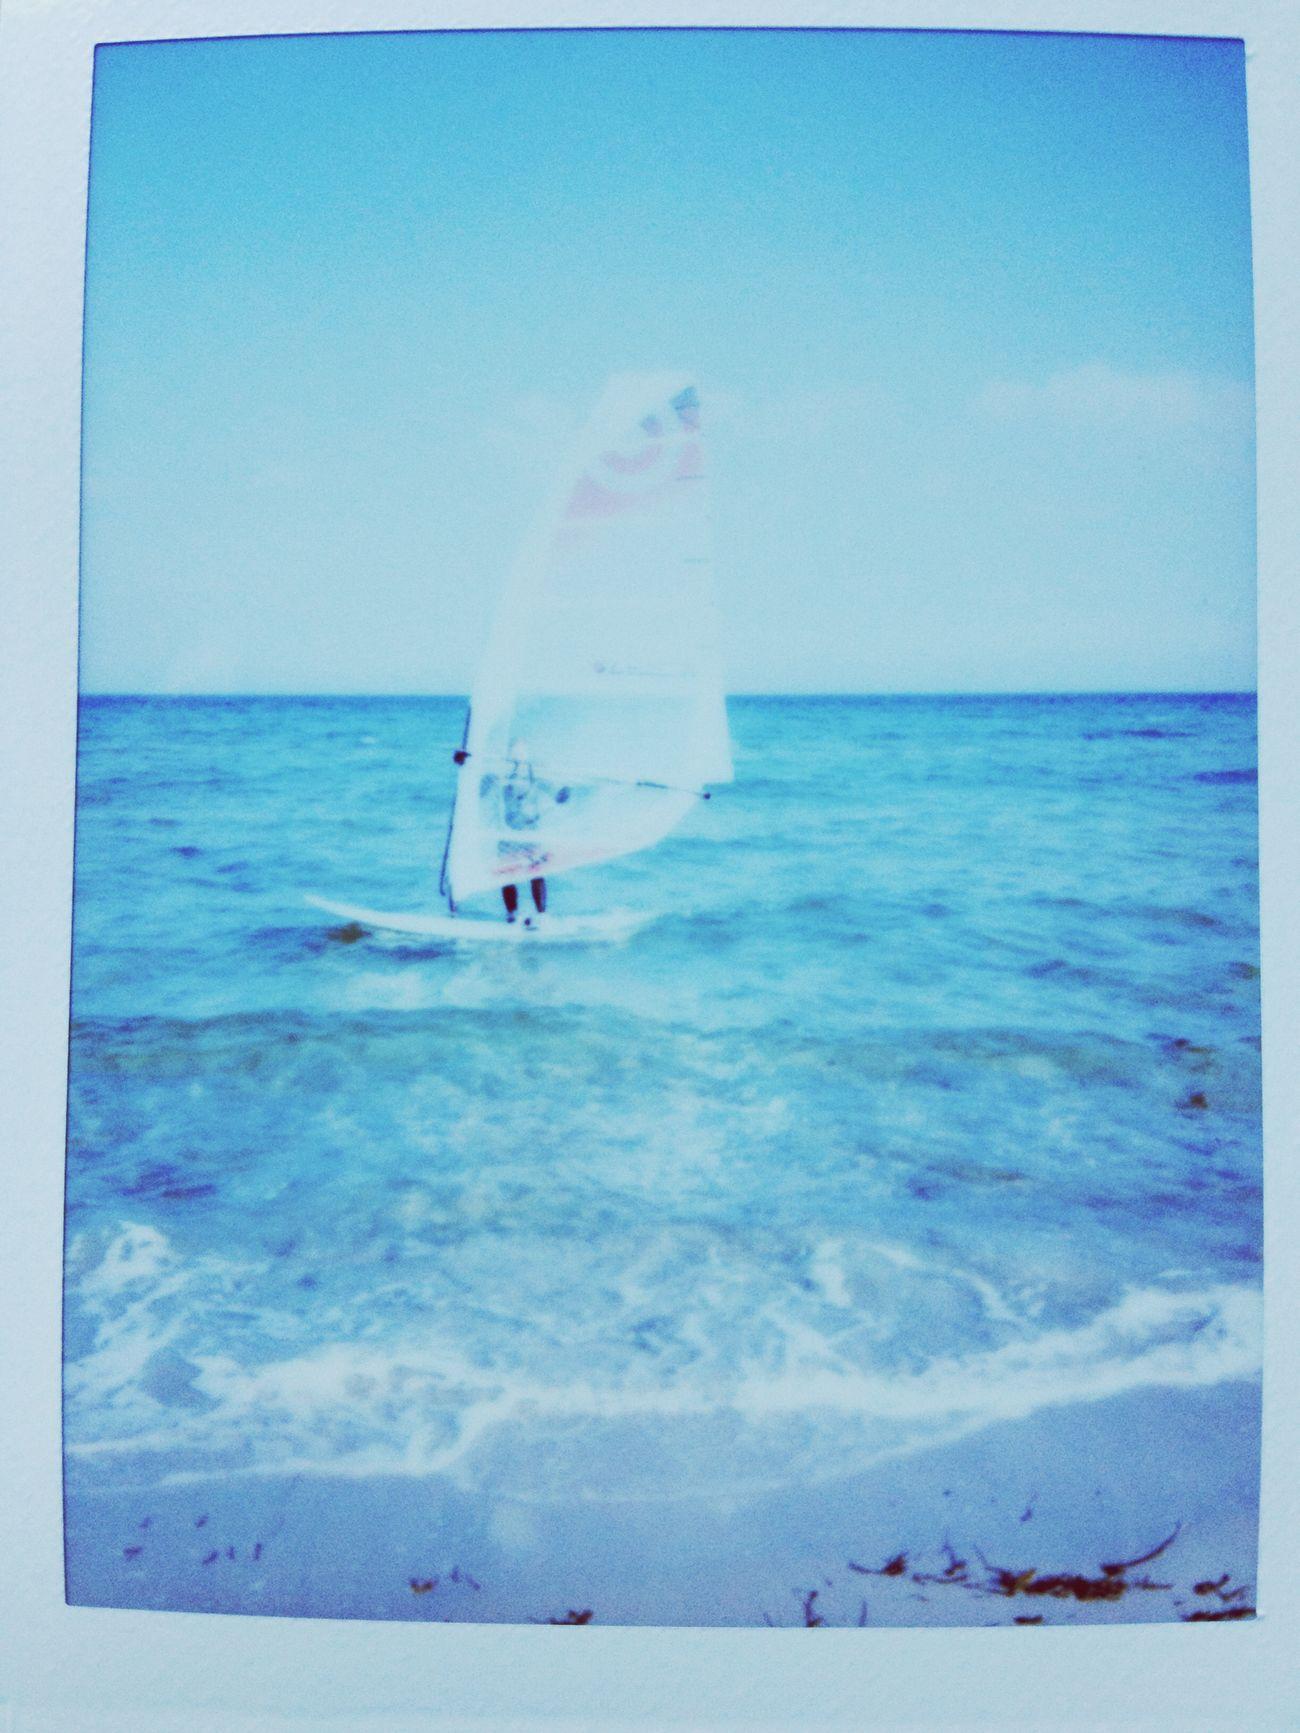 My Man Surfing Sea I Sit Rette Element